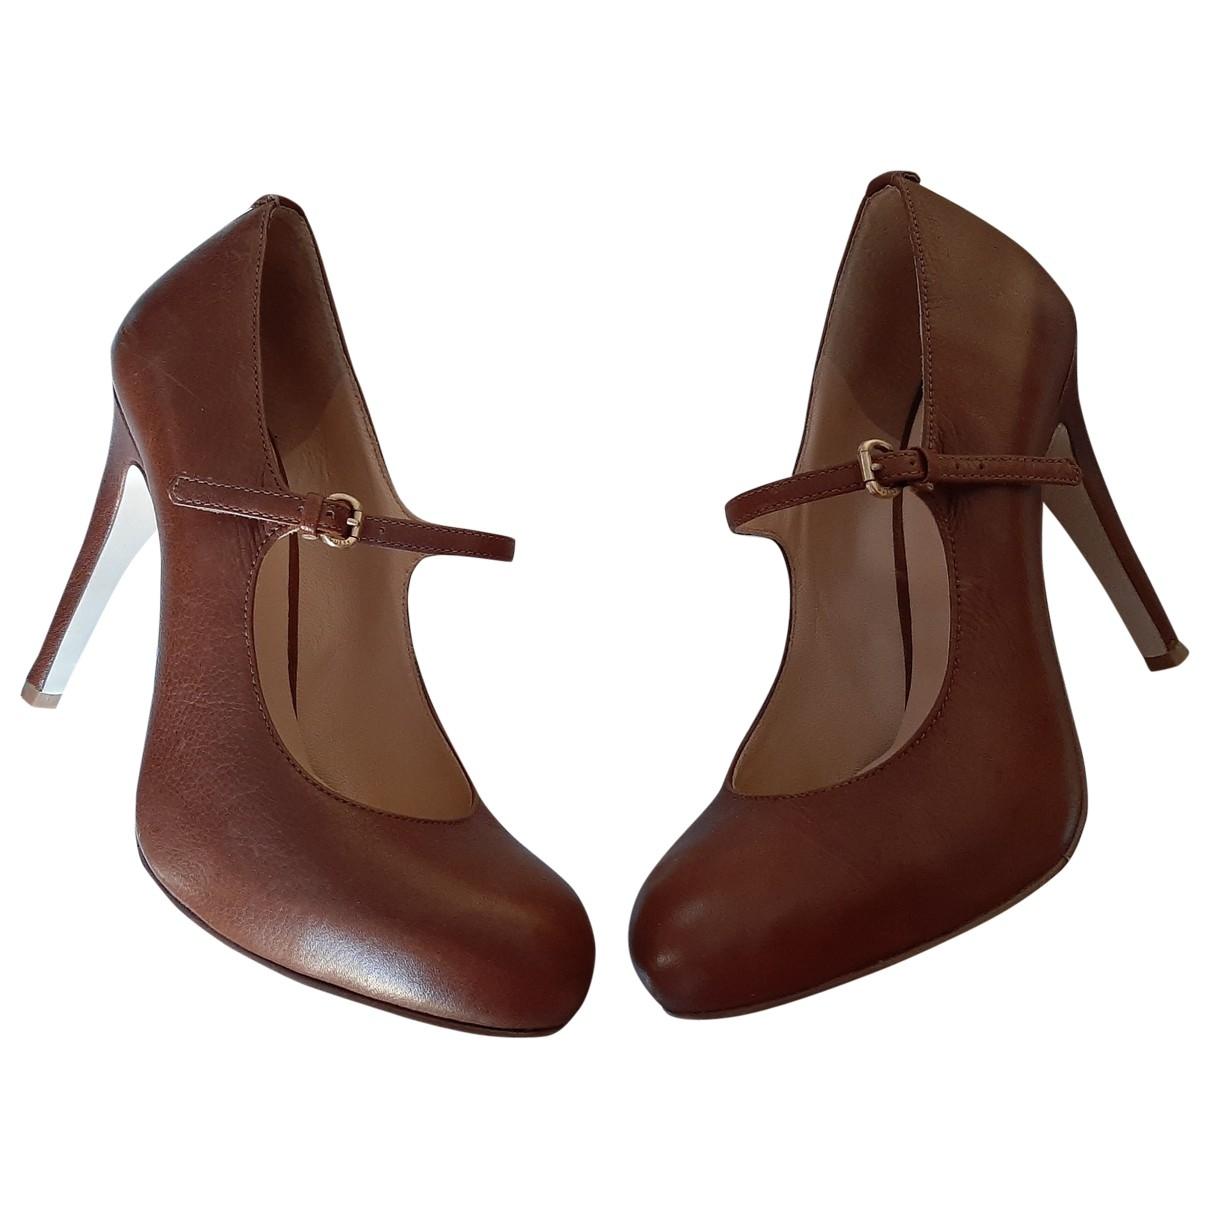 Guess \N Camel Leather Heels for Women 37 EU